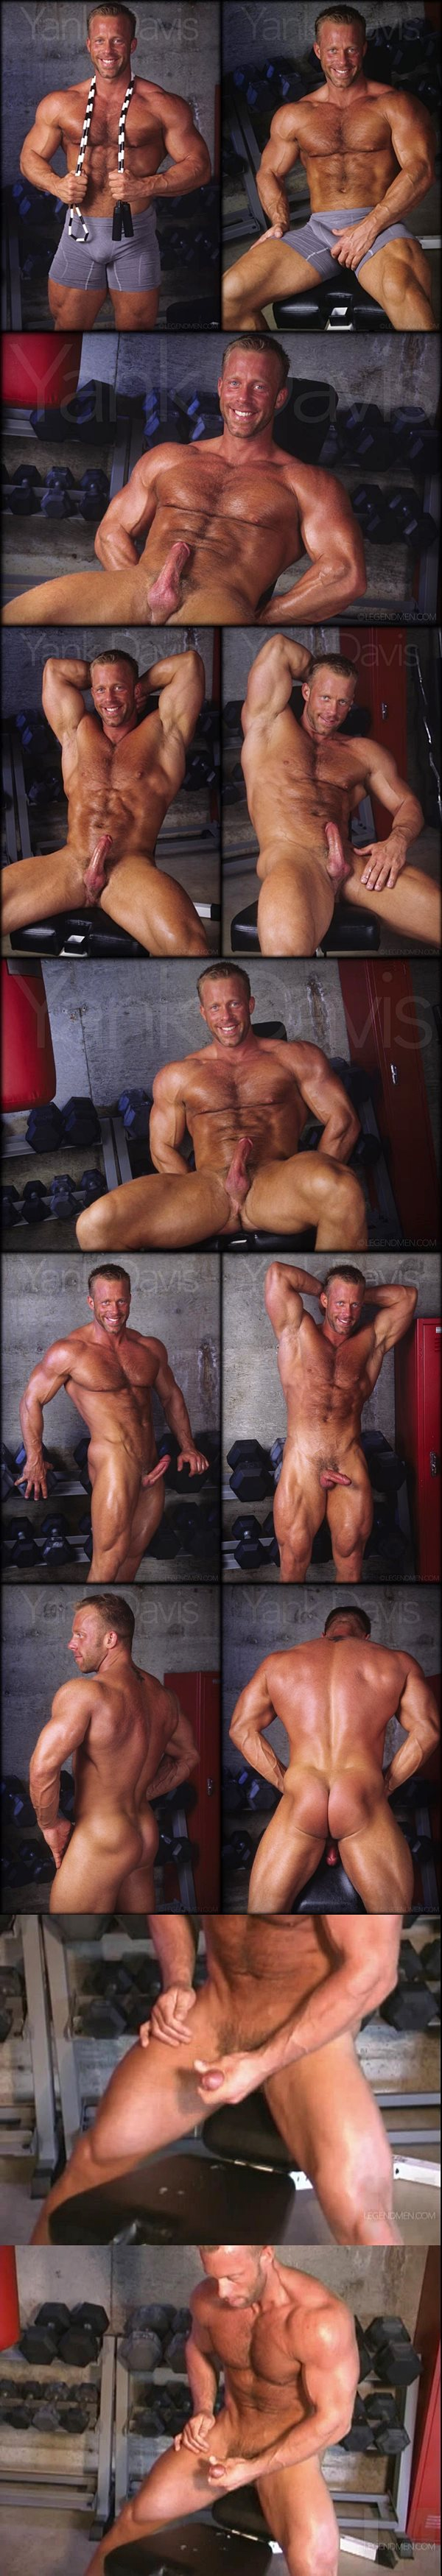 Masculine hunk Yank Davis jerks off at the gym at Legendmen